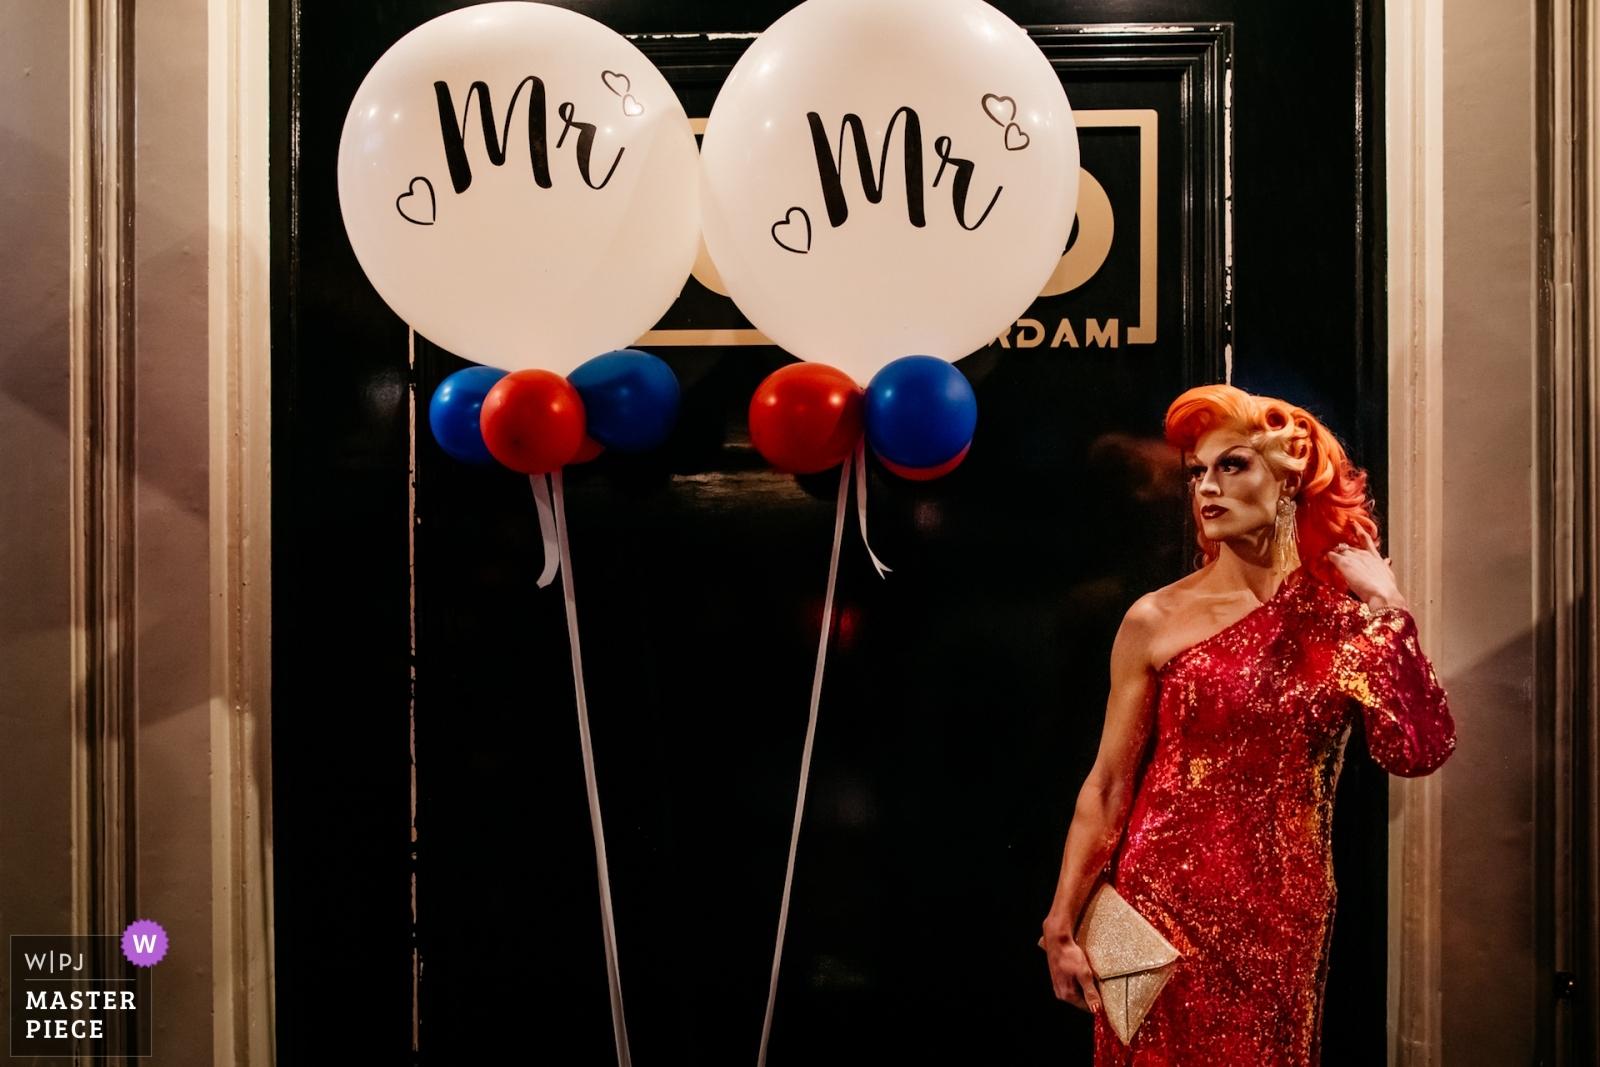 mr & mr balloons and drag queen - Utrecht, Netherlands Wedding Photography -  | reception venue